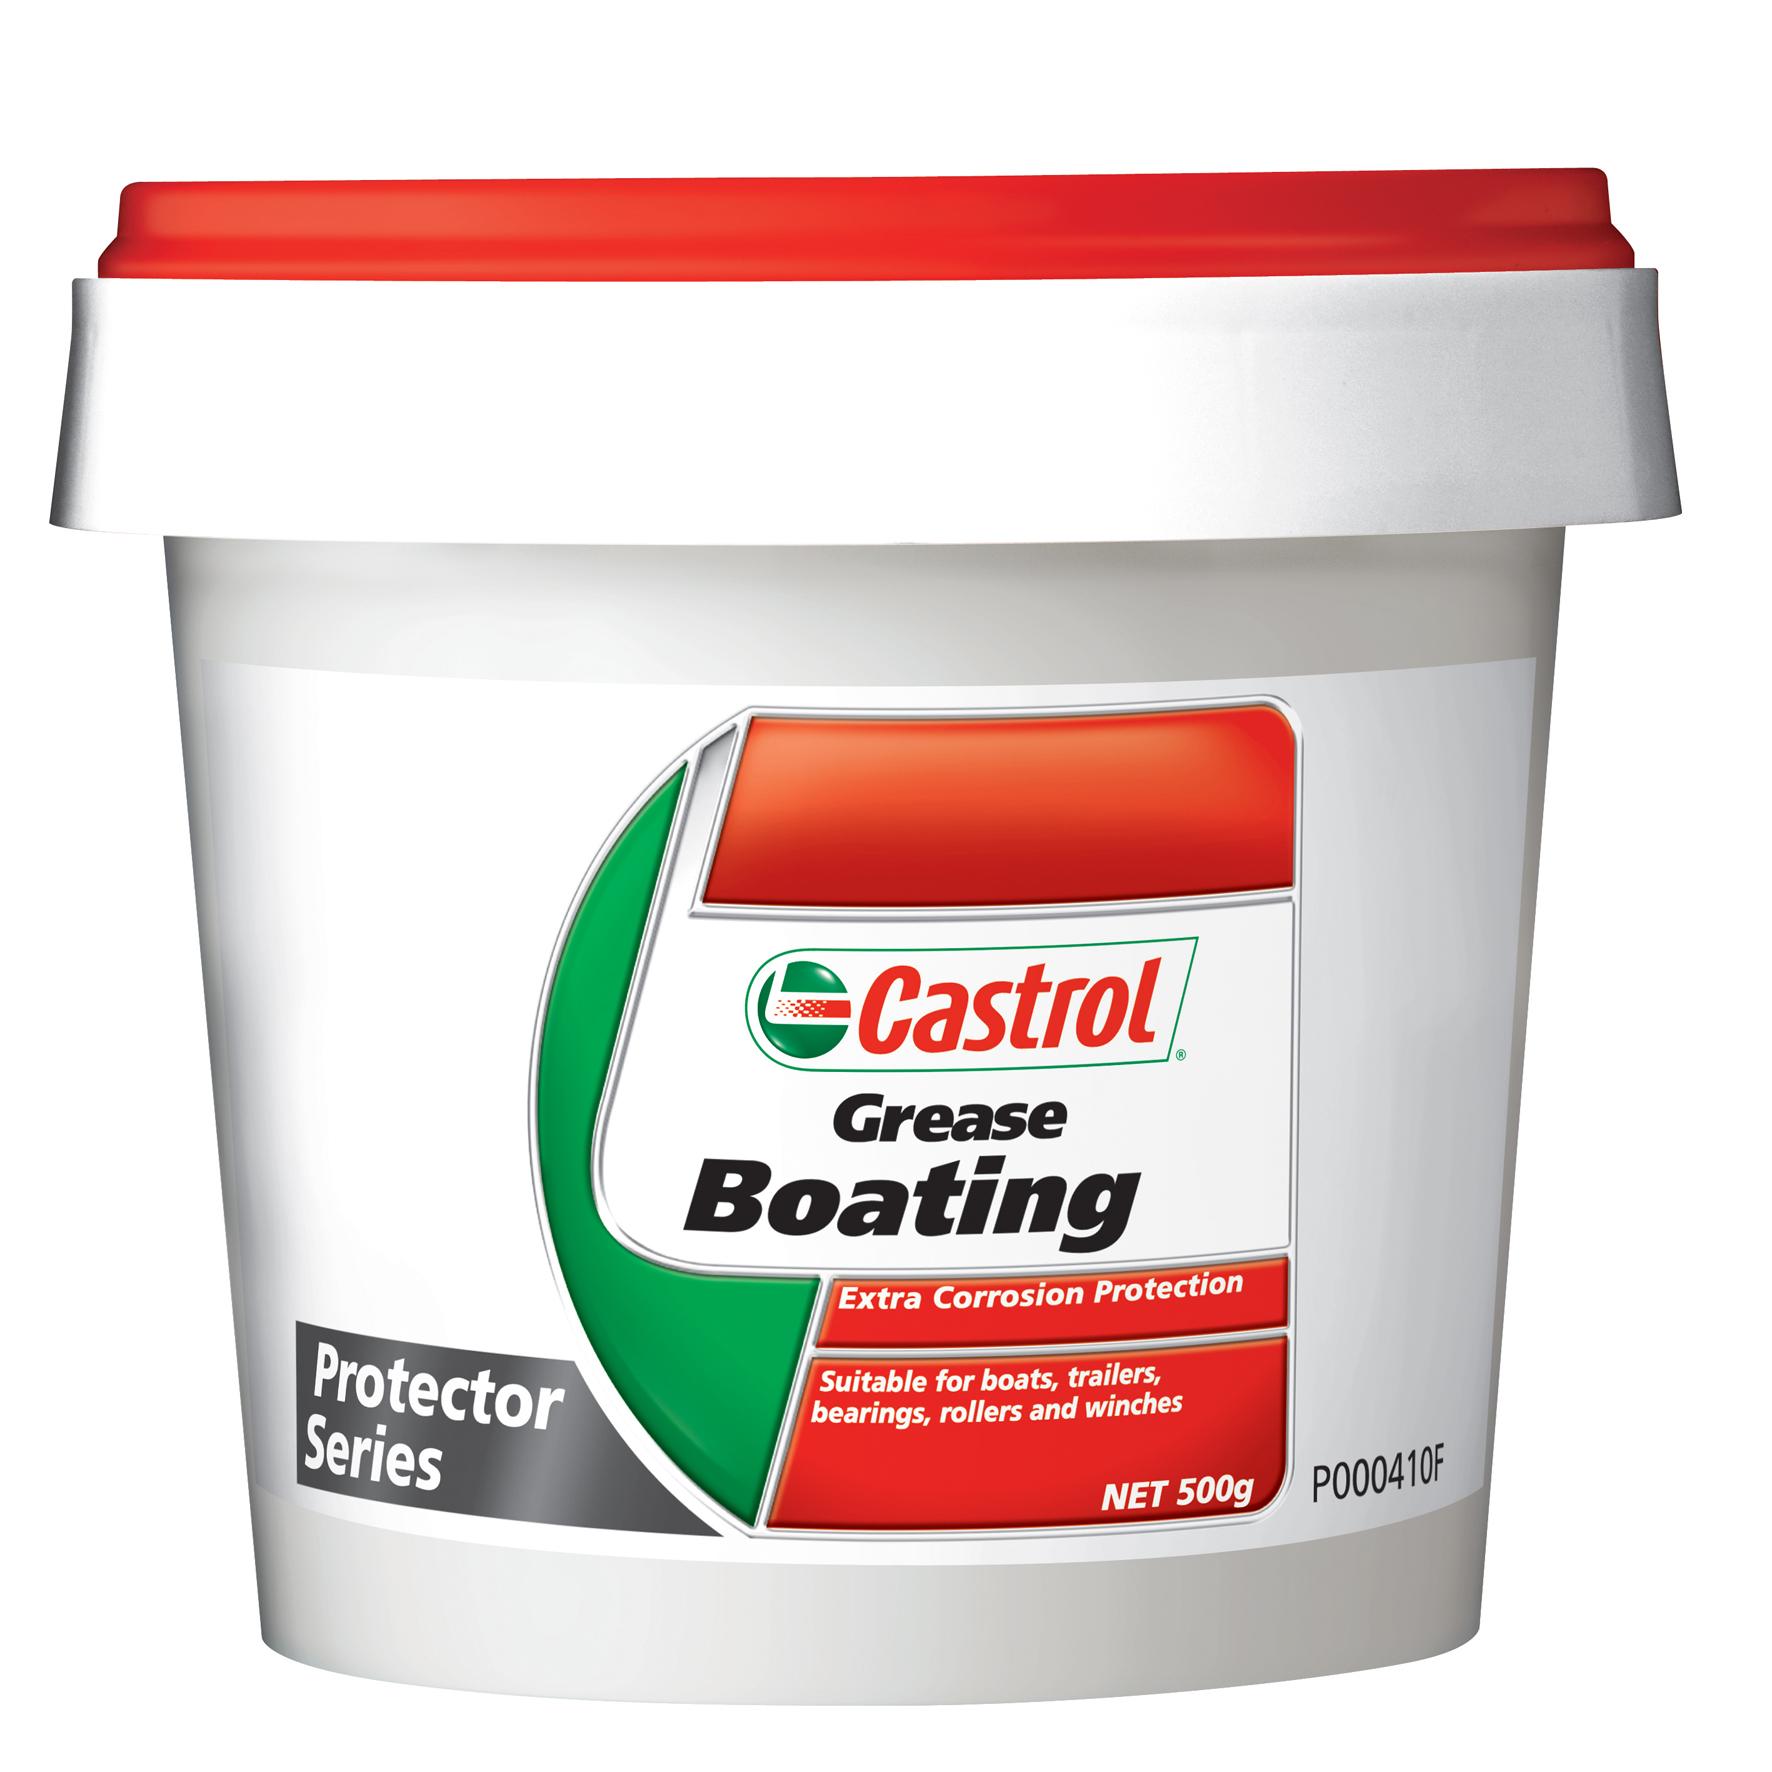 Bp Australia Pty Ltd Castrol Boating Grease And Castrol